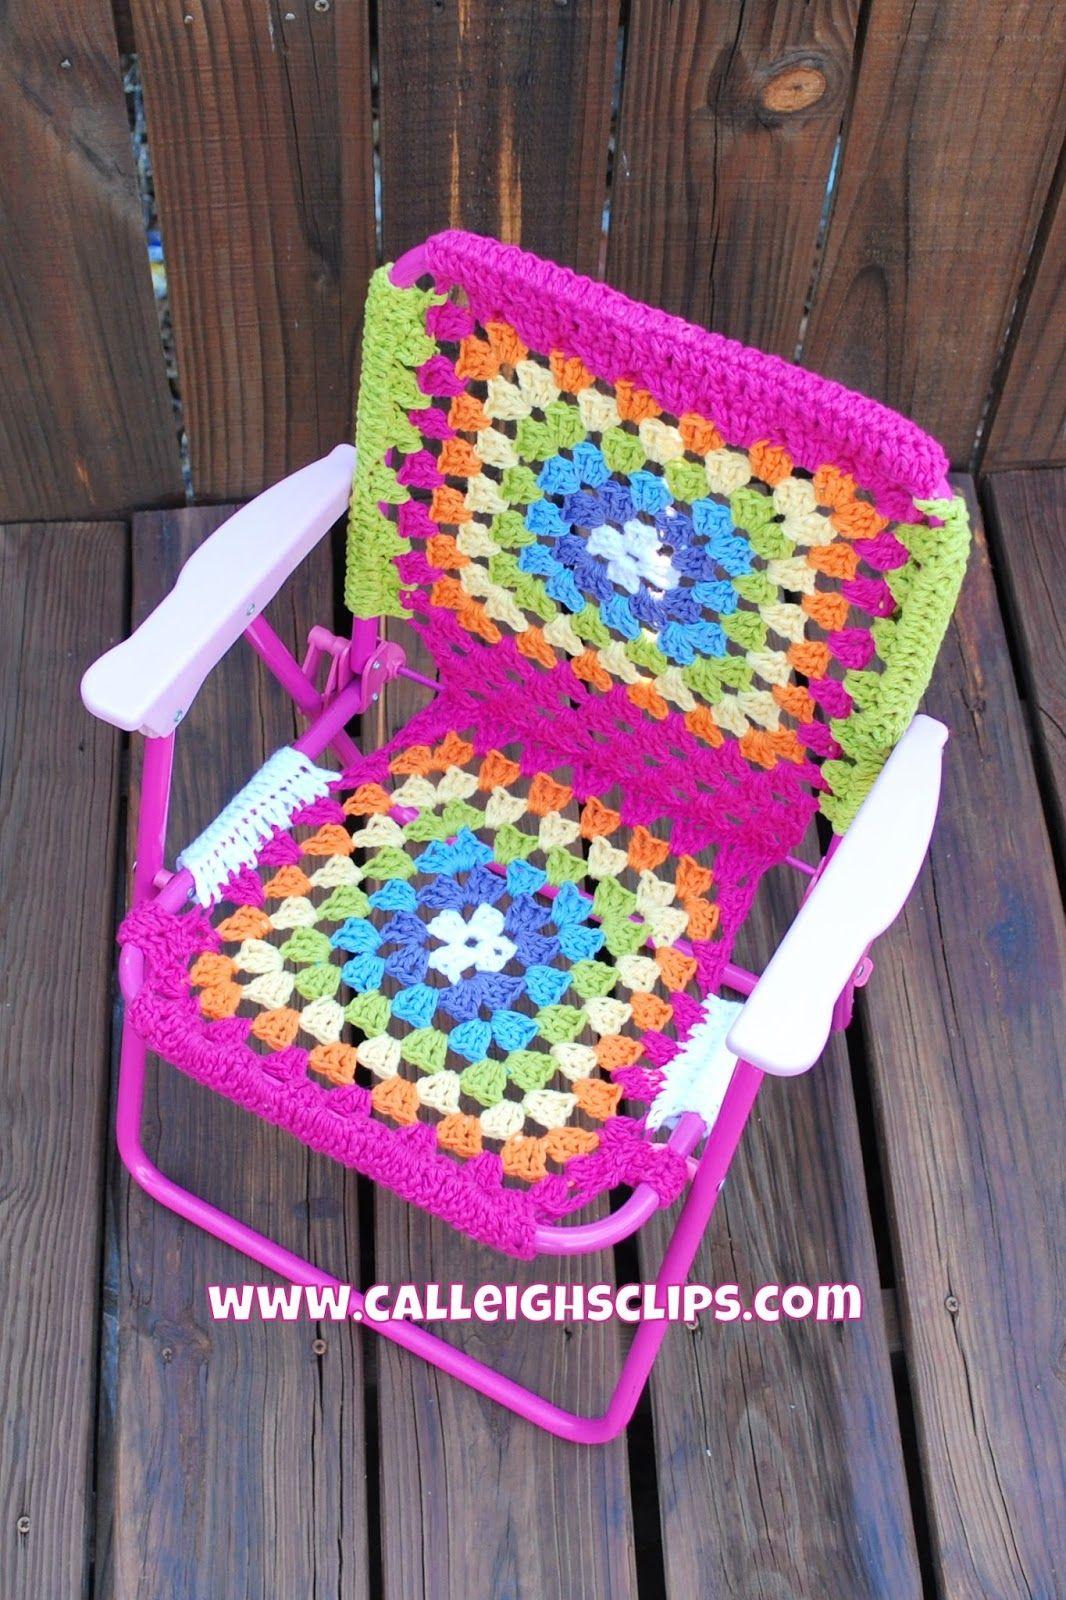 Folding Chair Crochet-Over